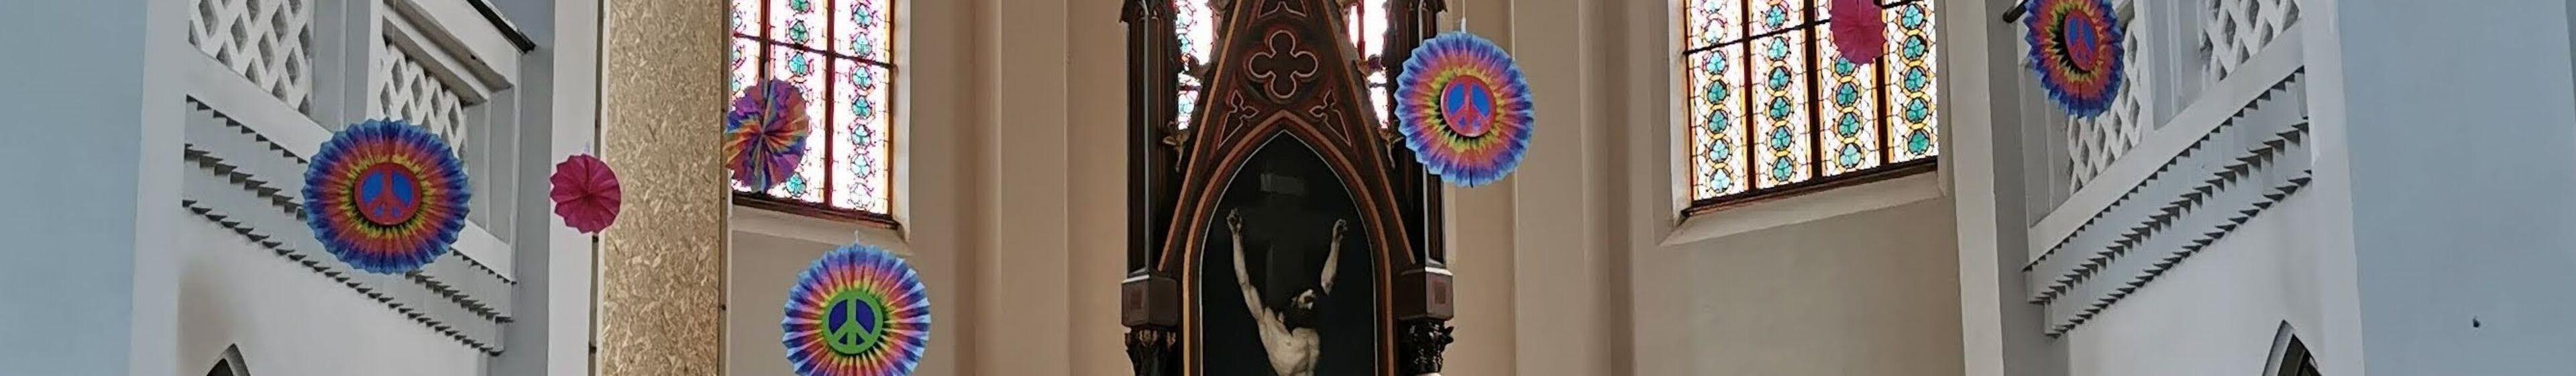 altarraum slider